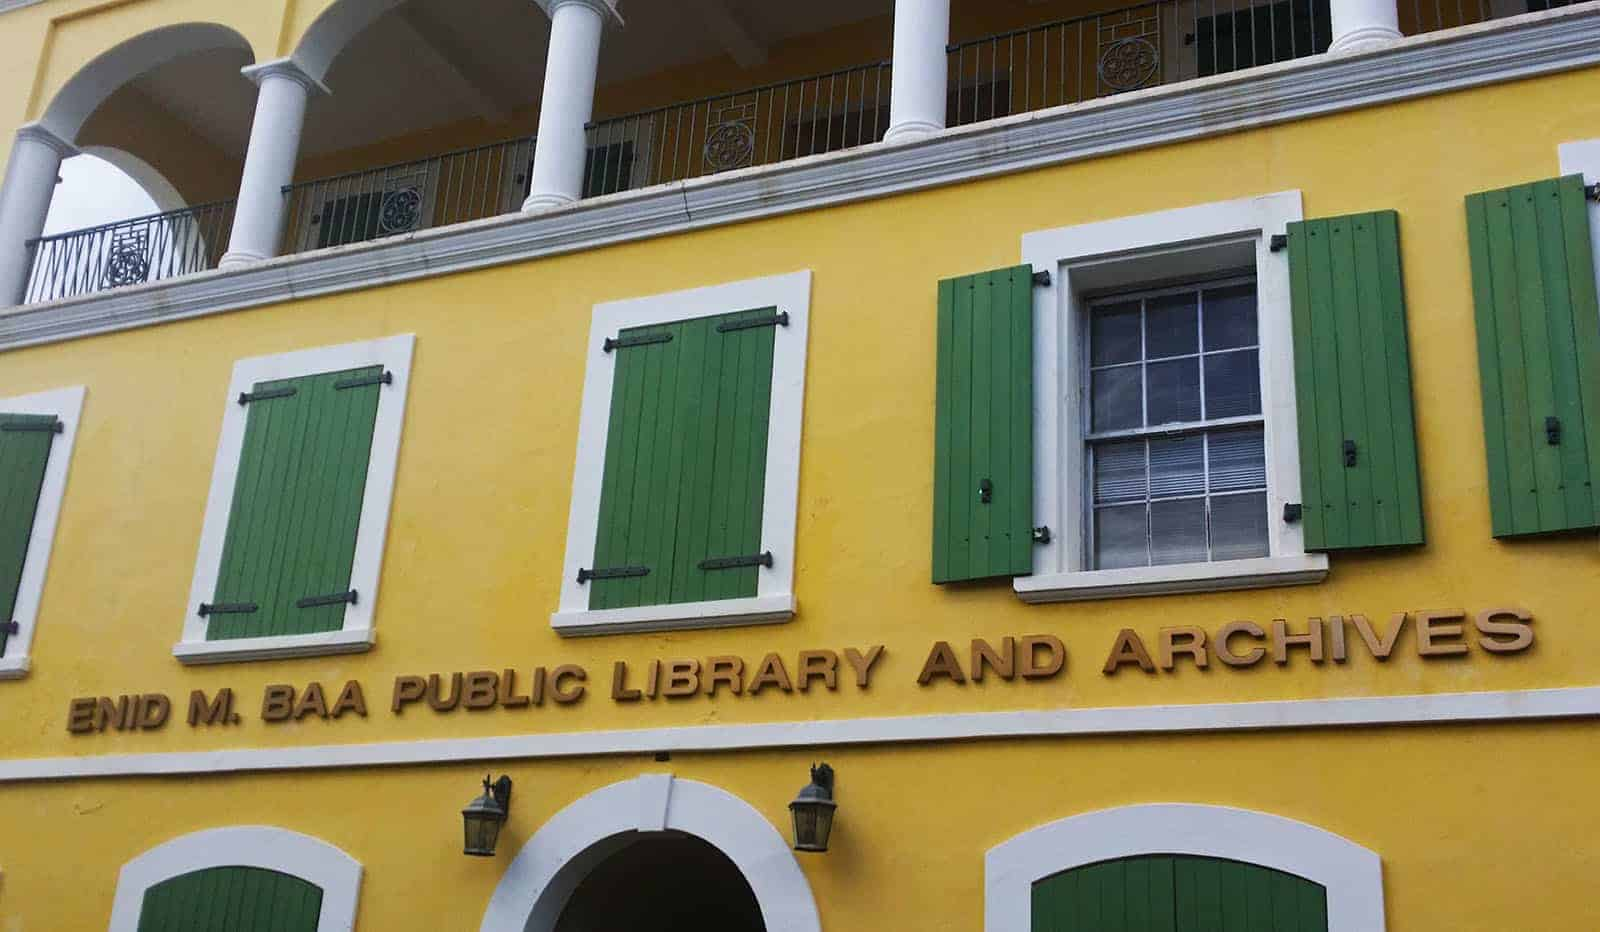 Public Library in Charlotte Amalie, St. Thomas